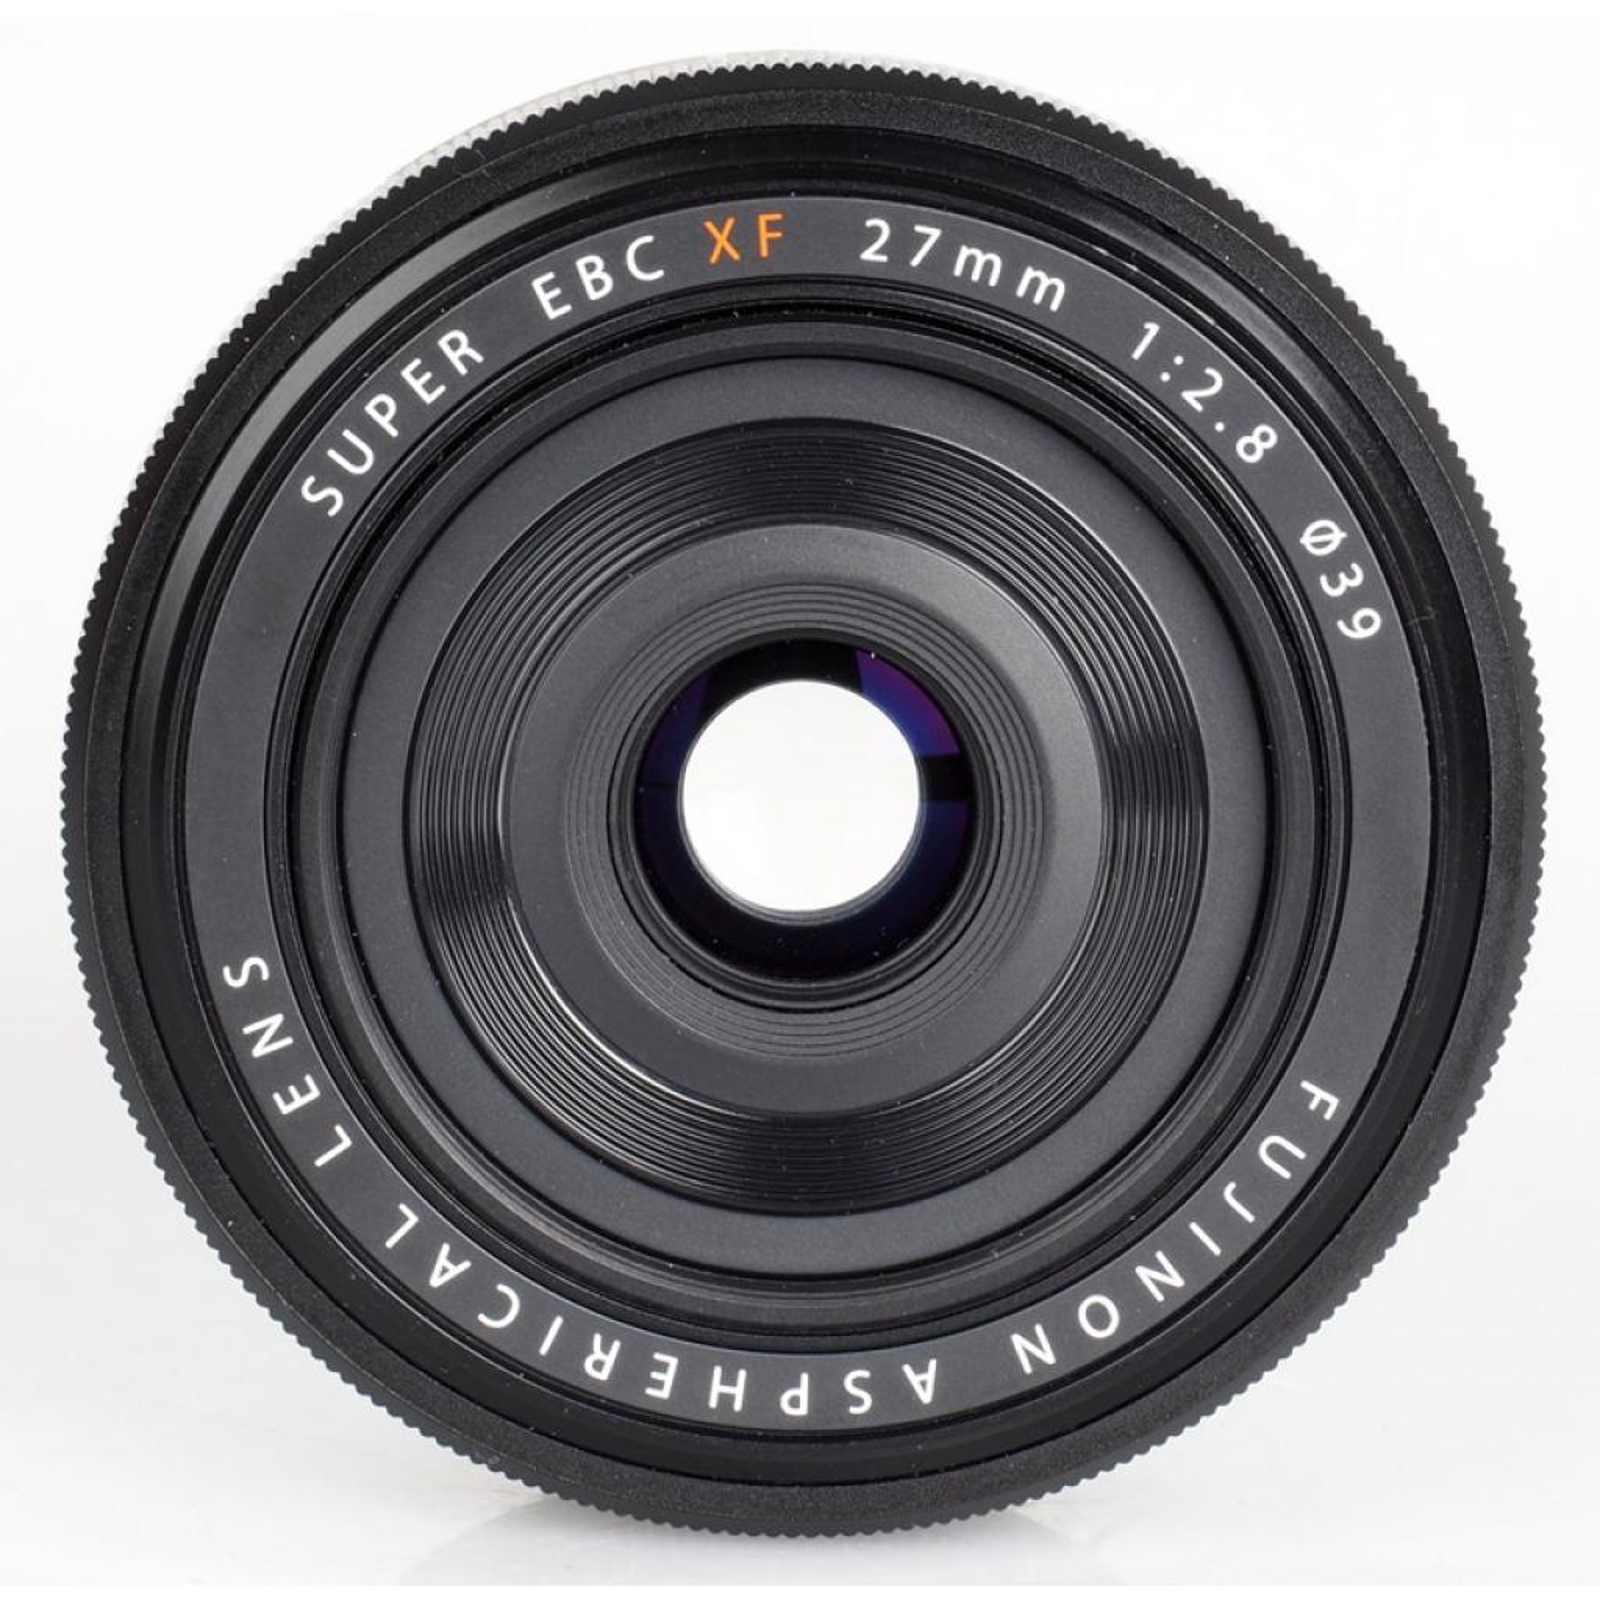 Объектив Fujifilm XF-27mm F2.8 (16389123) изображение 4